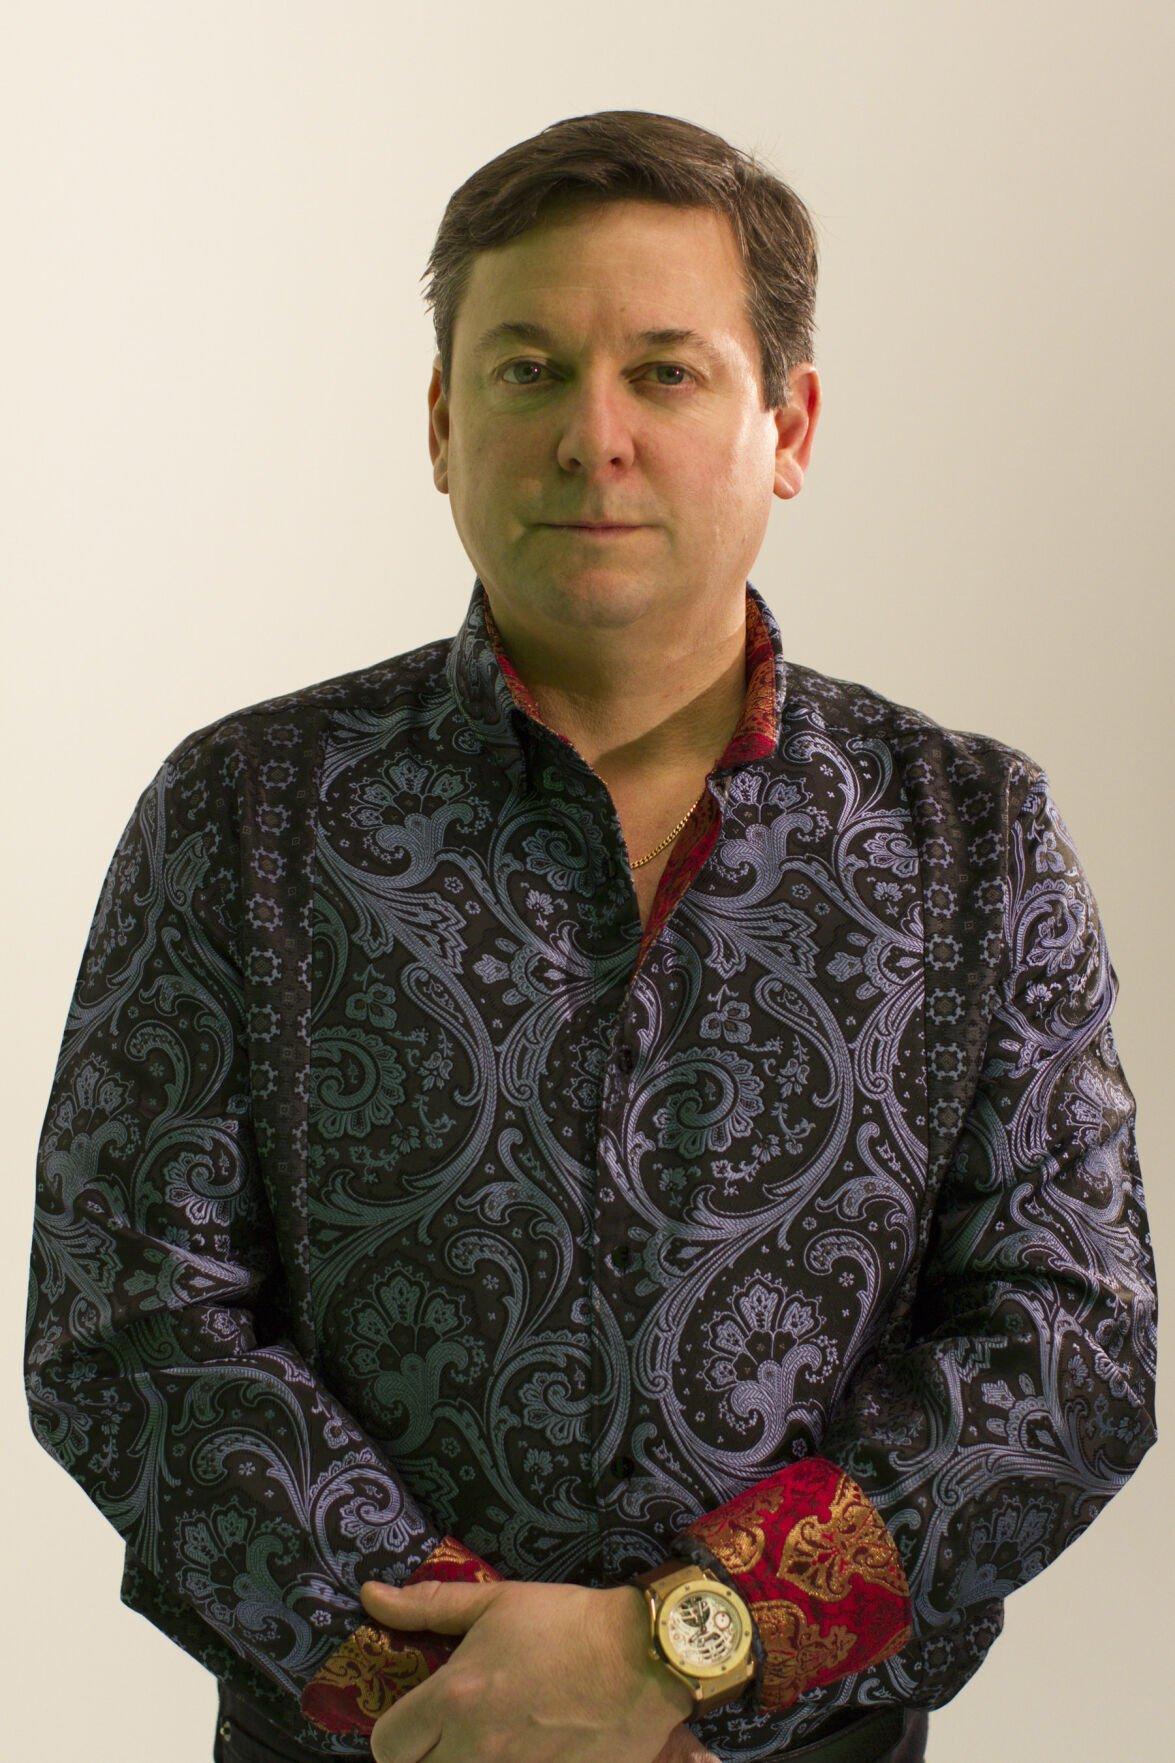 Scott Wilson, Co-Founder & CEO of Banty Inc.